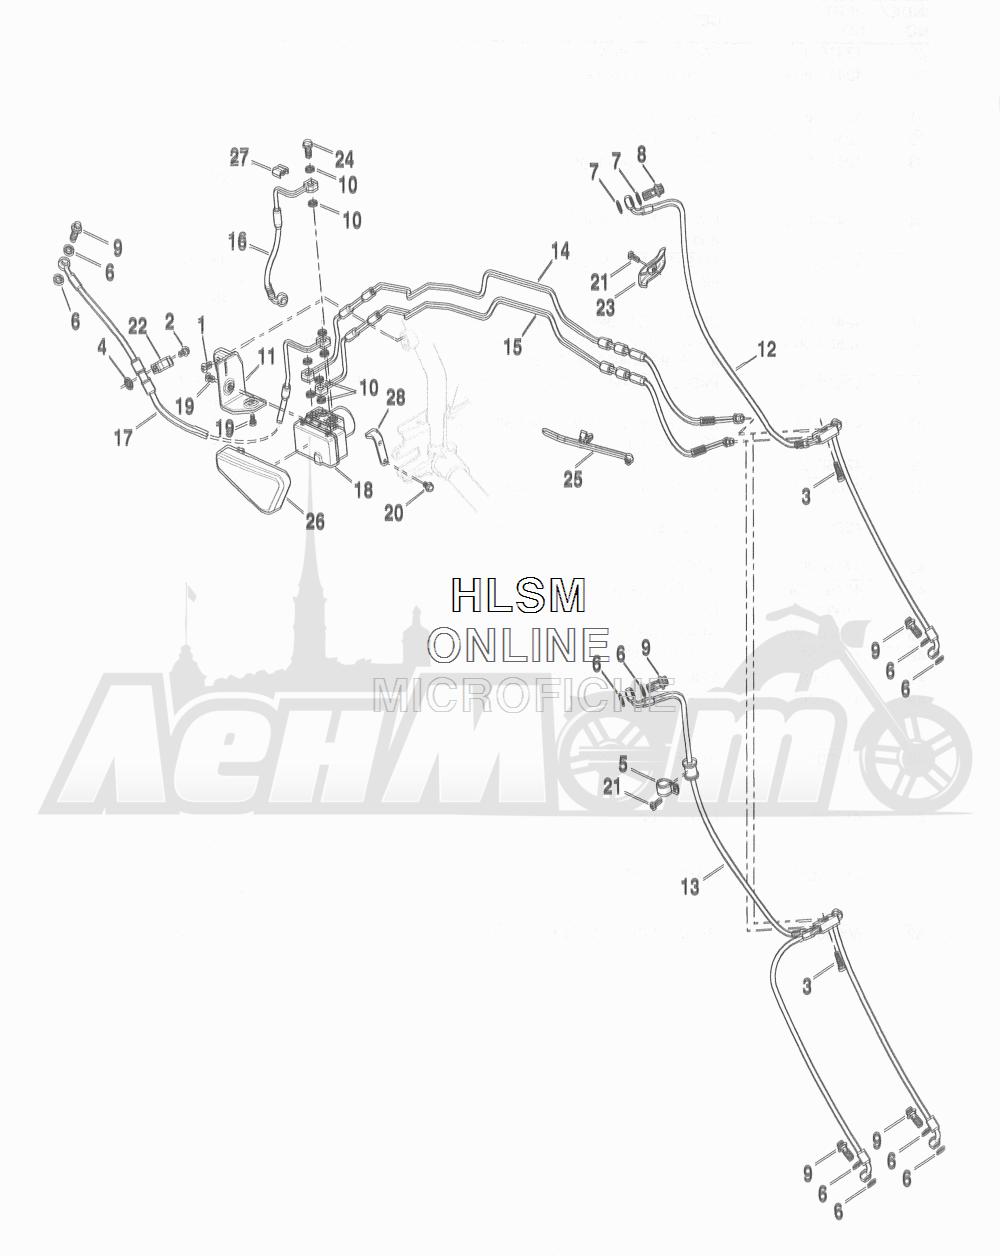 Запчасти для Мотоцикла Harley-Davidson 2016 FLD DYNA 96 SWITCHBACK (GZ4) Раздел: BRAKE - W/ MODULE AND LINES (ABS) | тормоза вместе с модуль и магистрали (ABS)